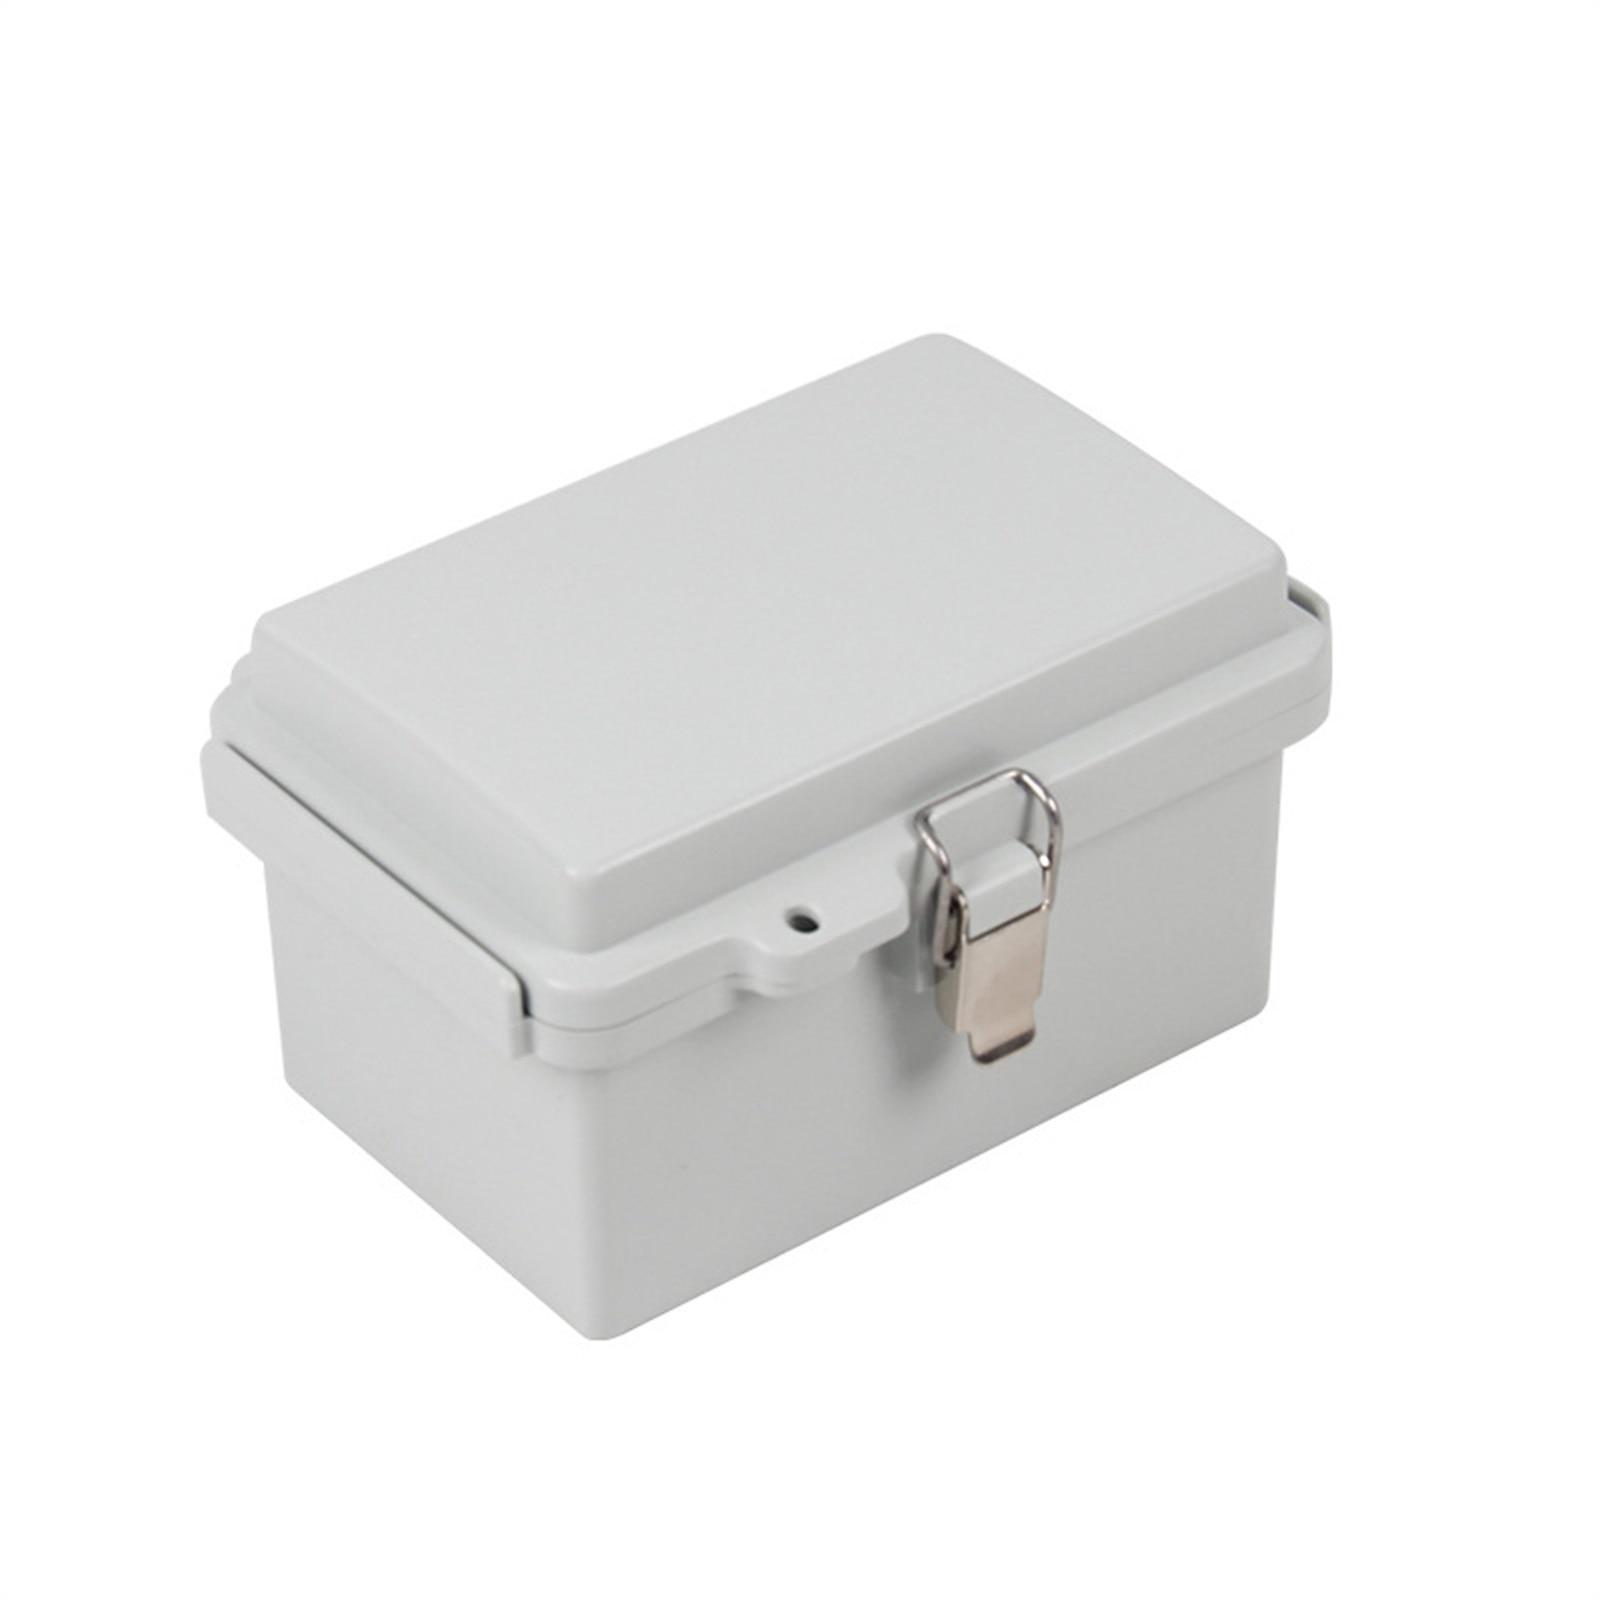 IP66 علبة توزيع إلكترونيات كهربائية ، مشبك ABS مقاوم للماء صندوق وصلات ، البلاستيك الضميمة ، توزيع الإسكان في الهواء الطلق أداة الإسكان